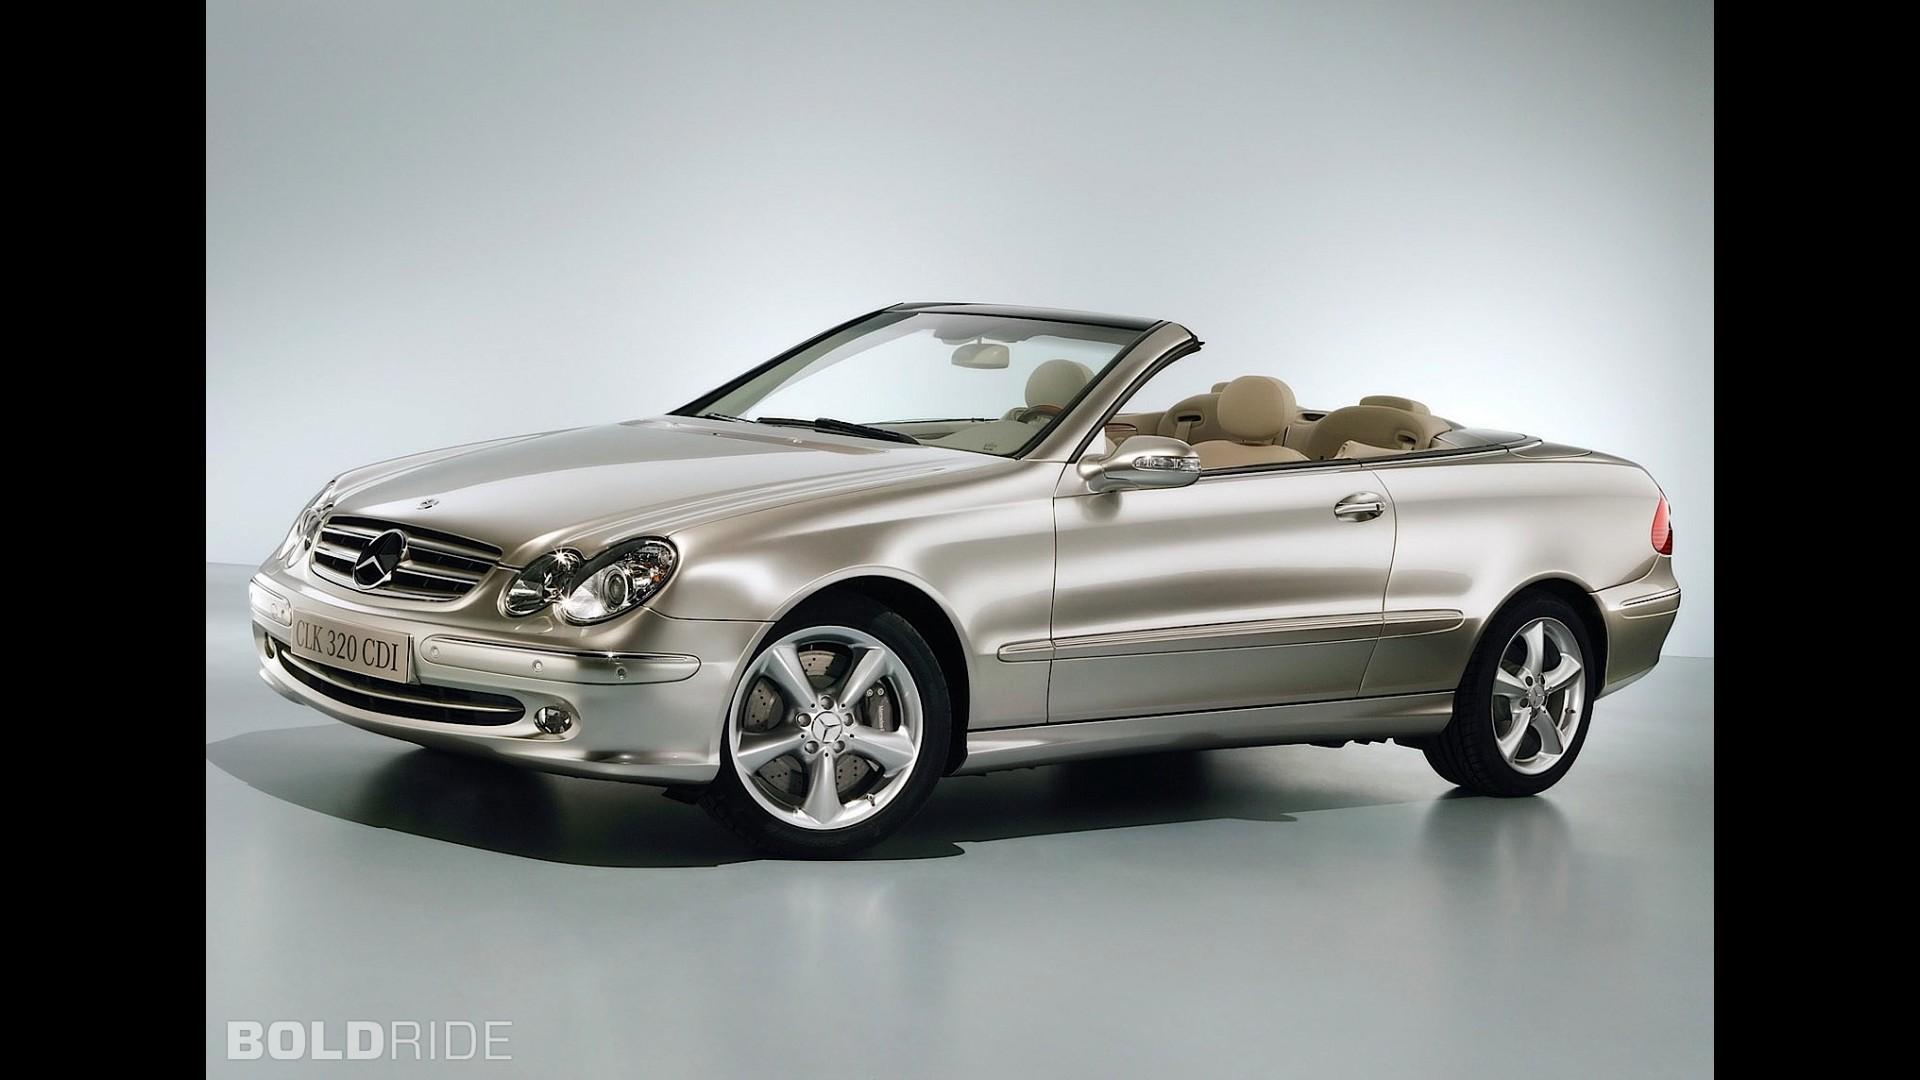 Mercedes benz clk320 cdi cabriolet for Mercedes benz clk convertible